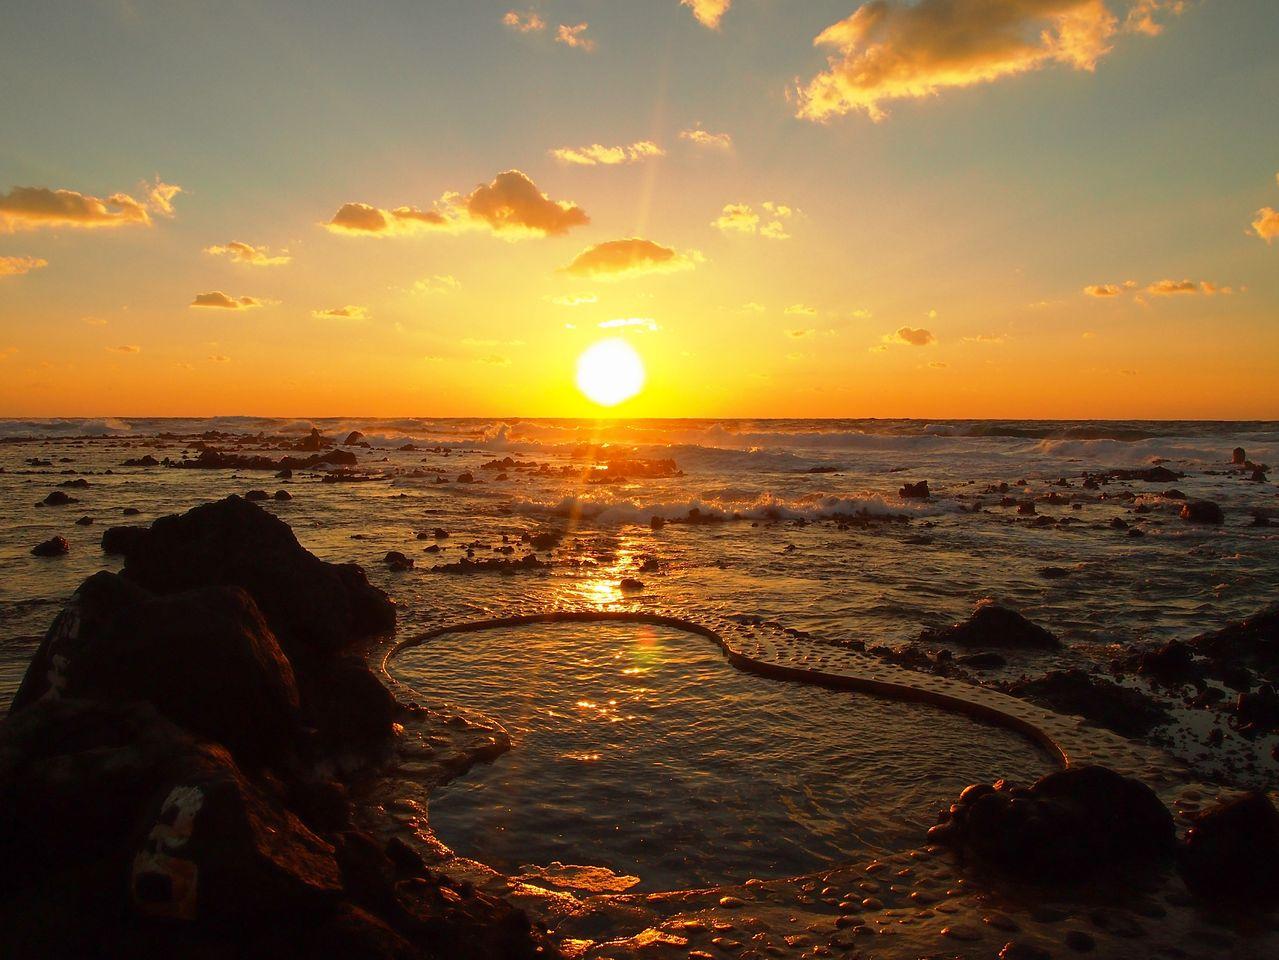 Купальня конъёку в лучах закатного солнца (фотография предоставлена «Коганэсаки Фурофуси-онсэн»)